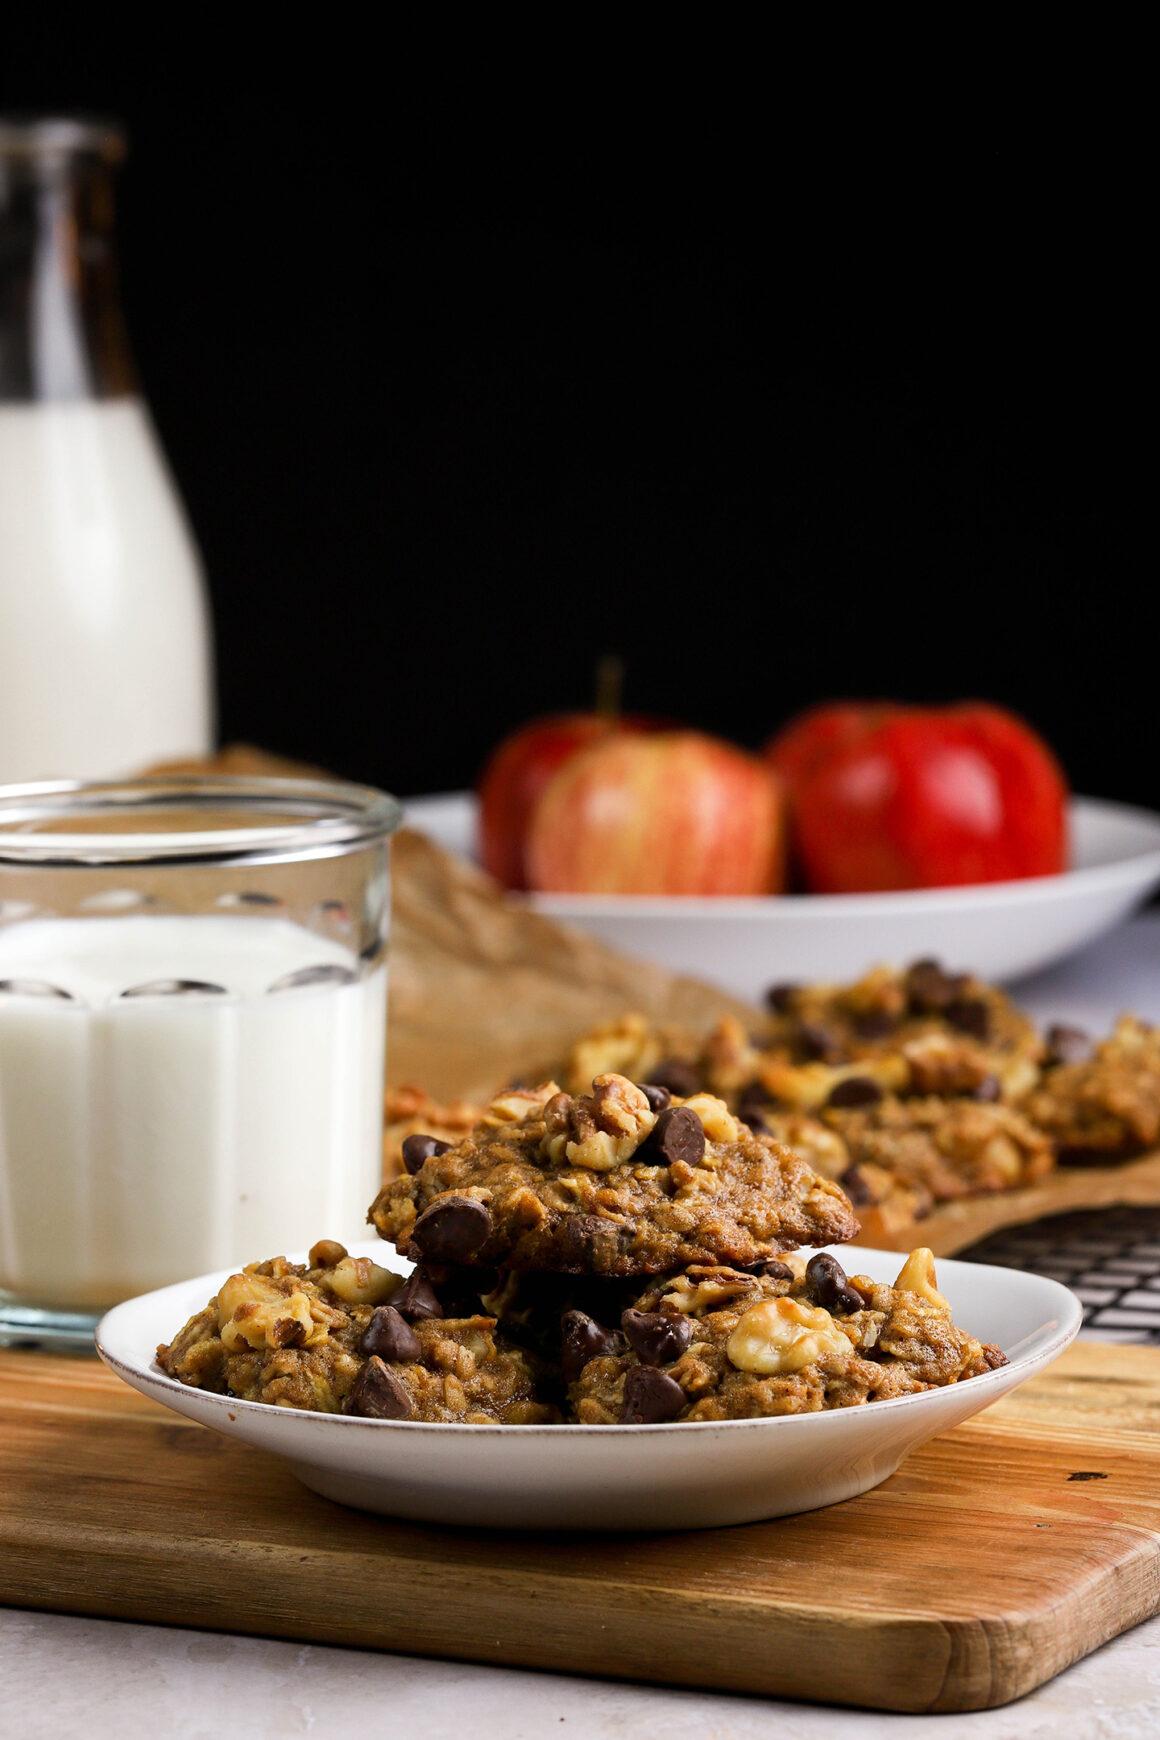 apple and chocolate oatmeal cookies